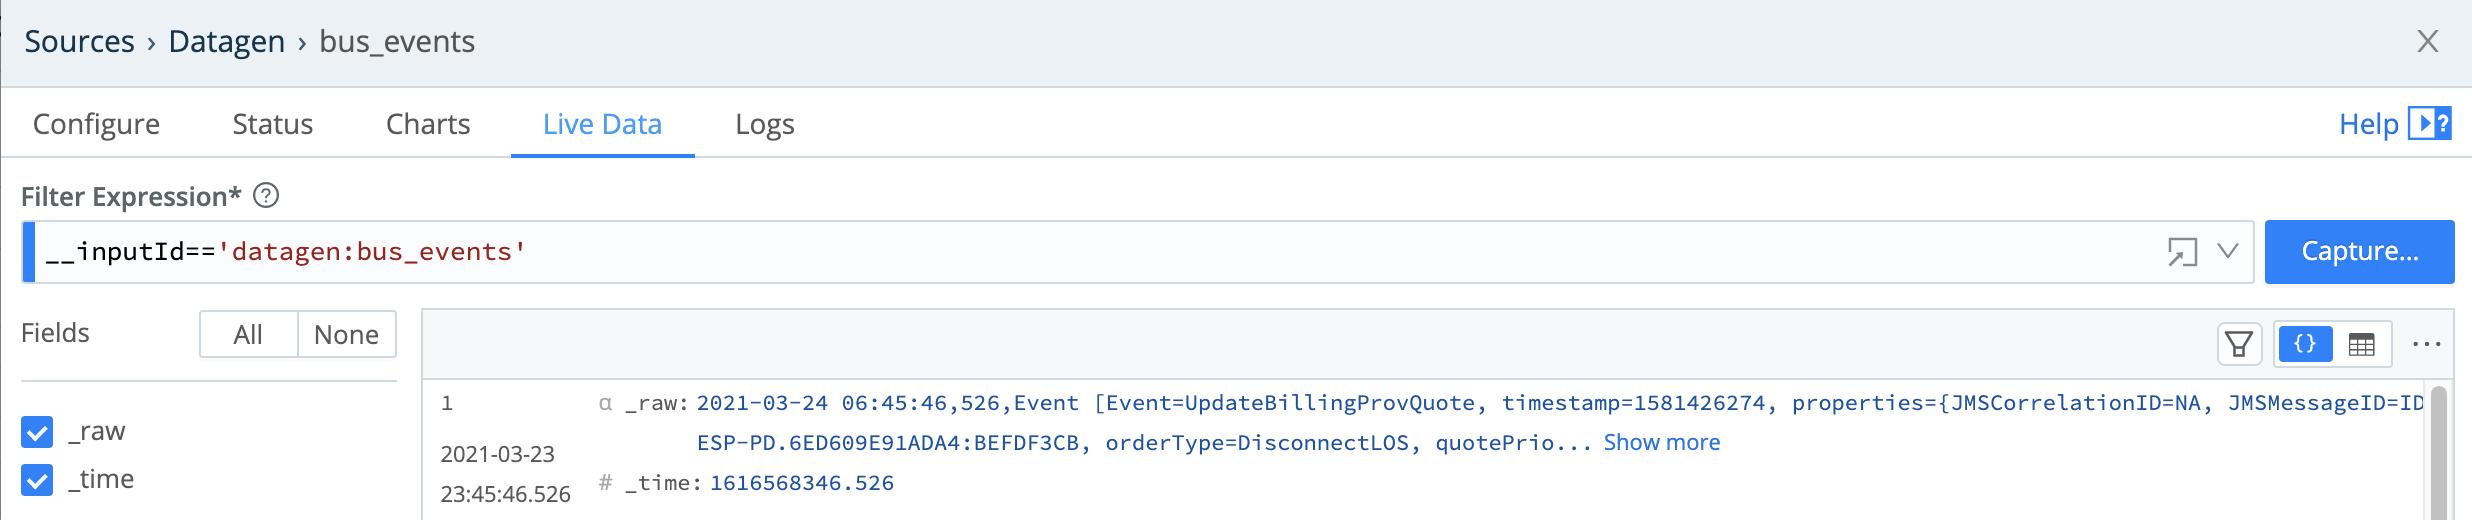 Source modal > Live Data tab